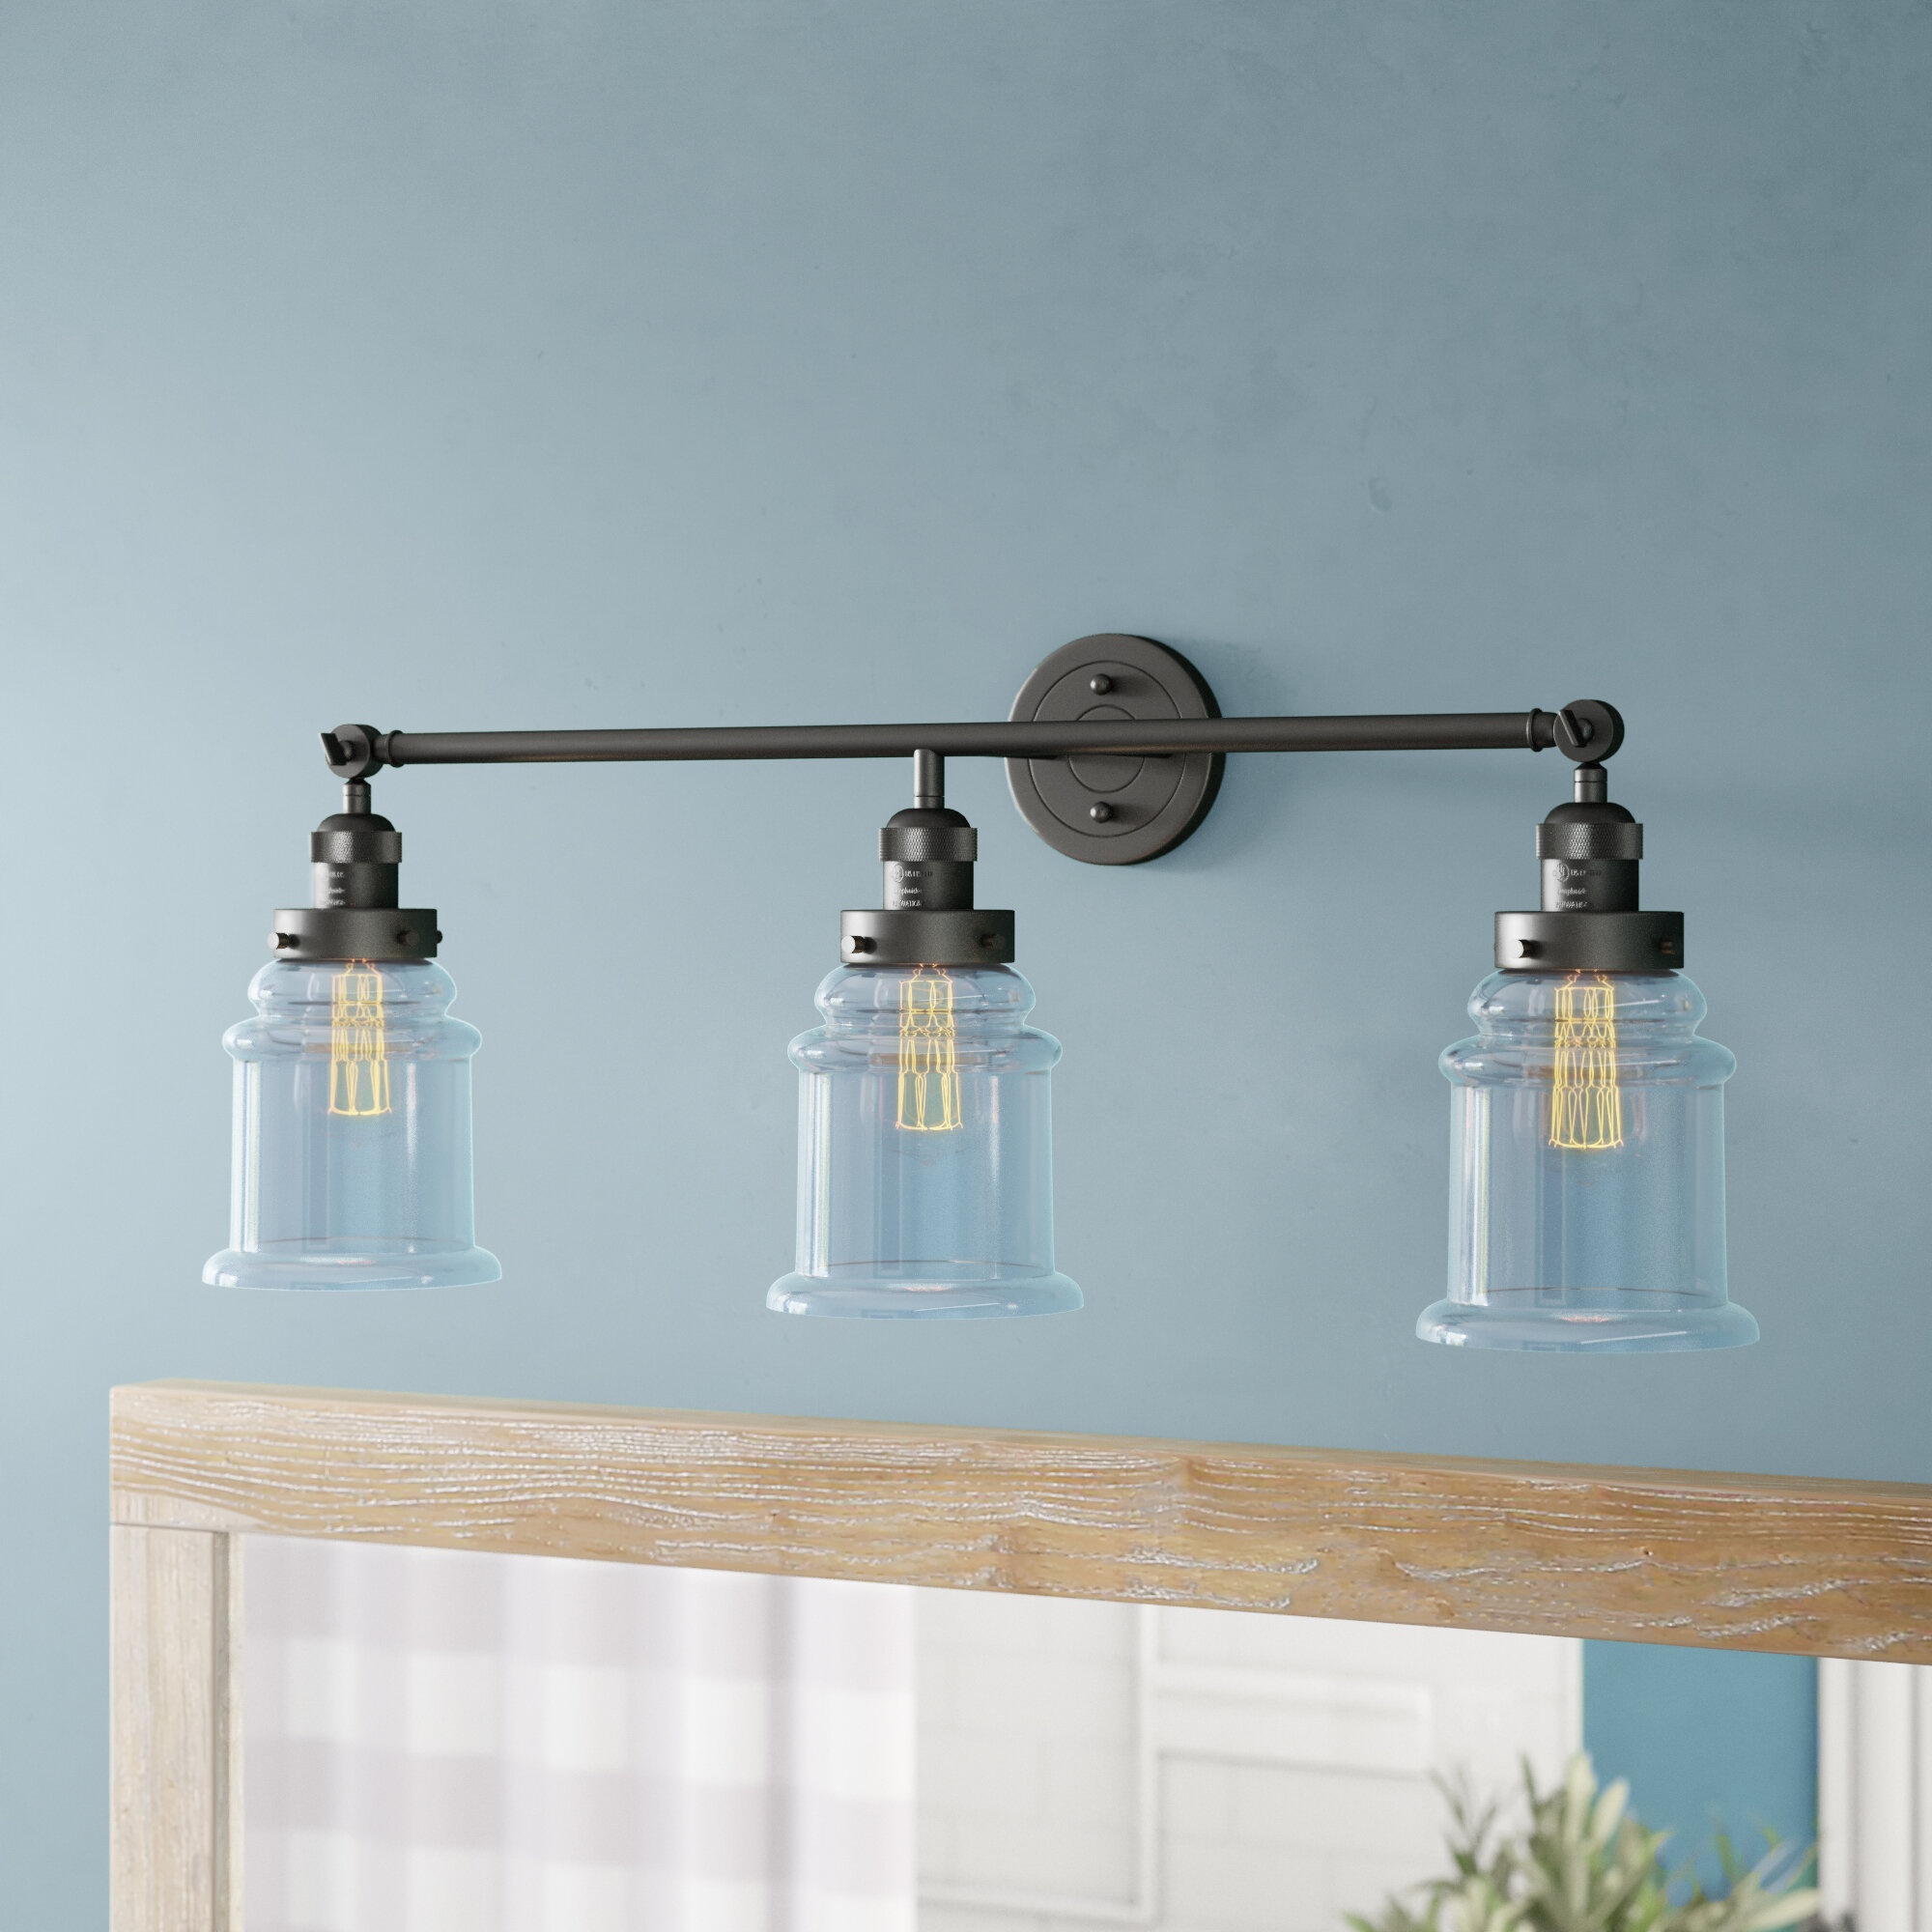 The Kitchen Greeley: Laurel Foundry Modern Farmhouse Greeley 3-Light Vanity